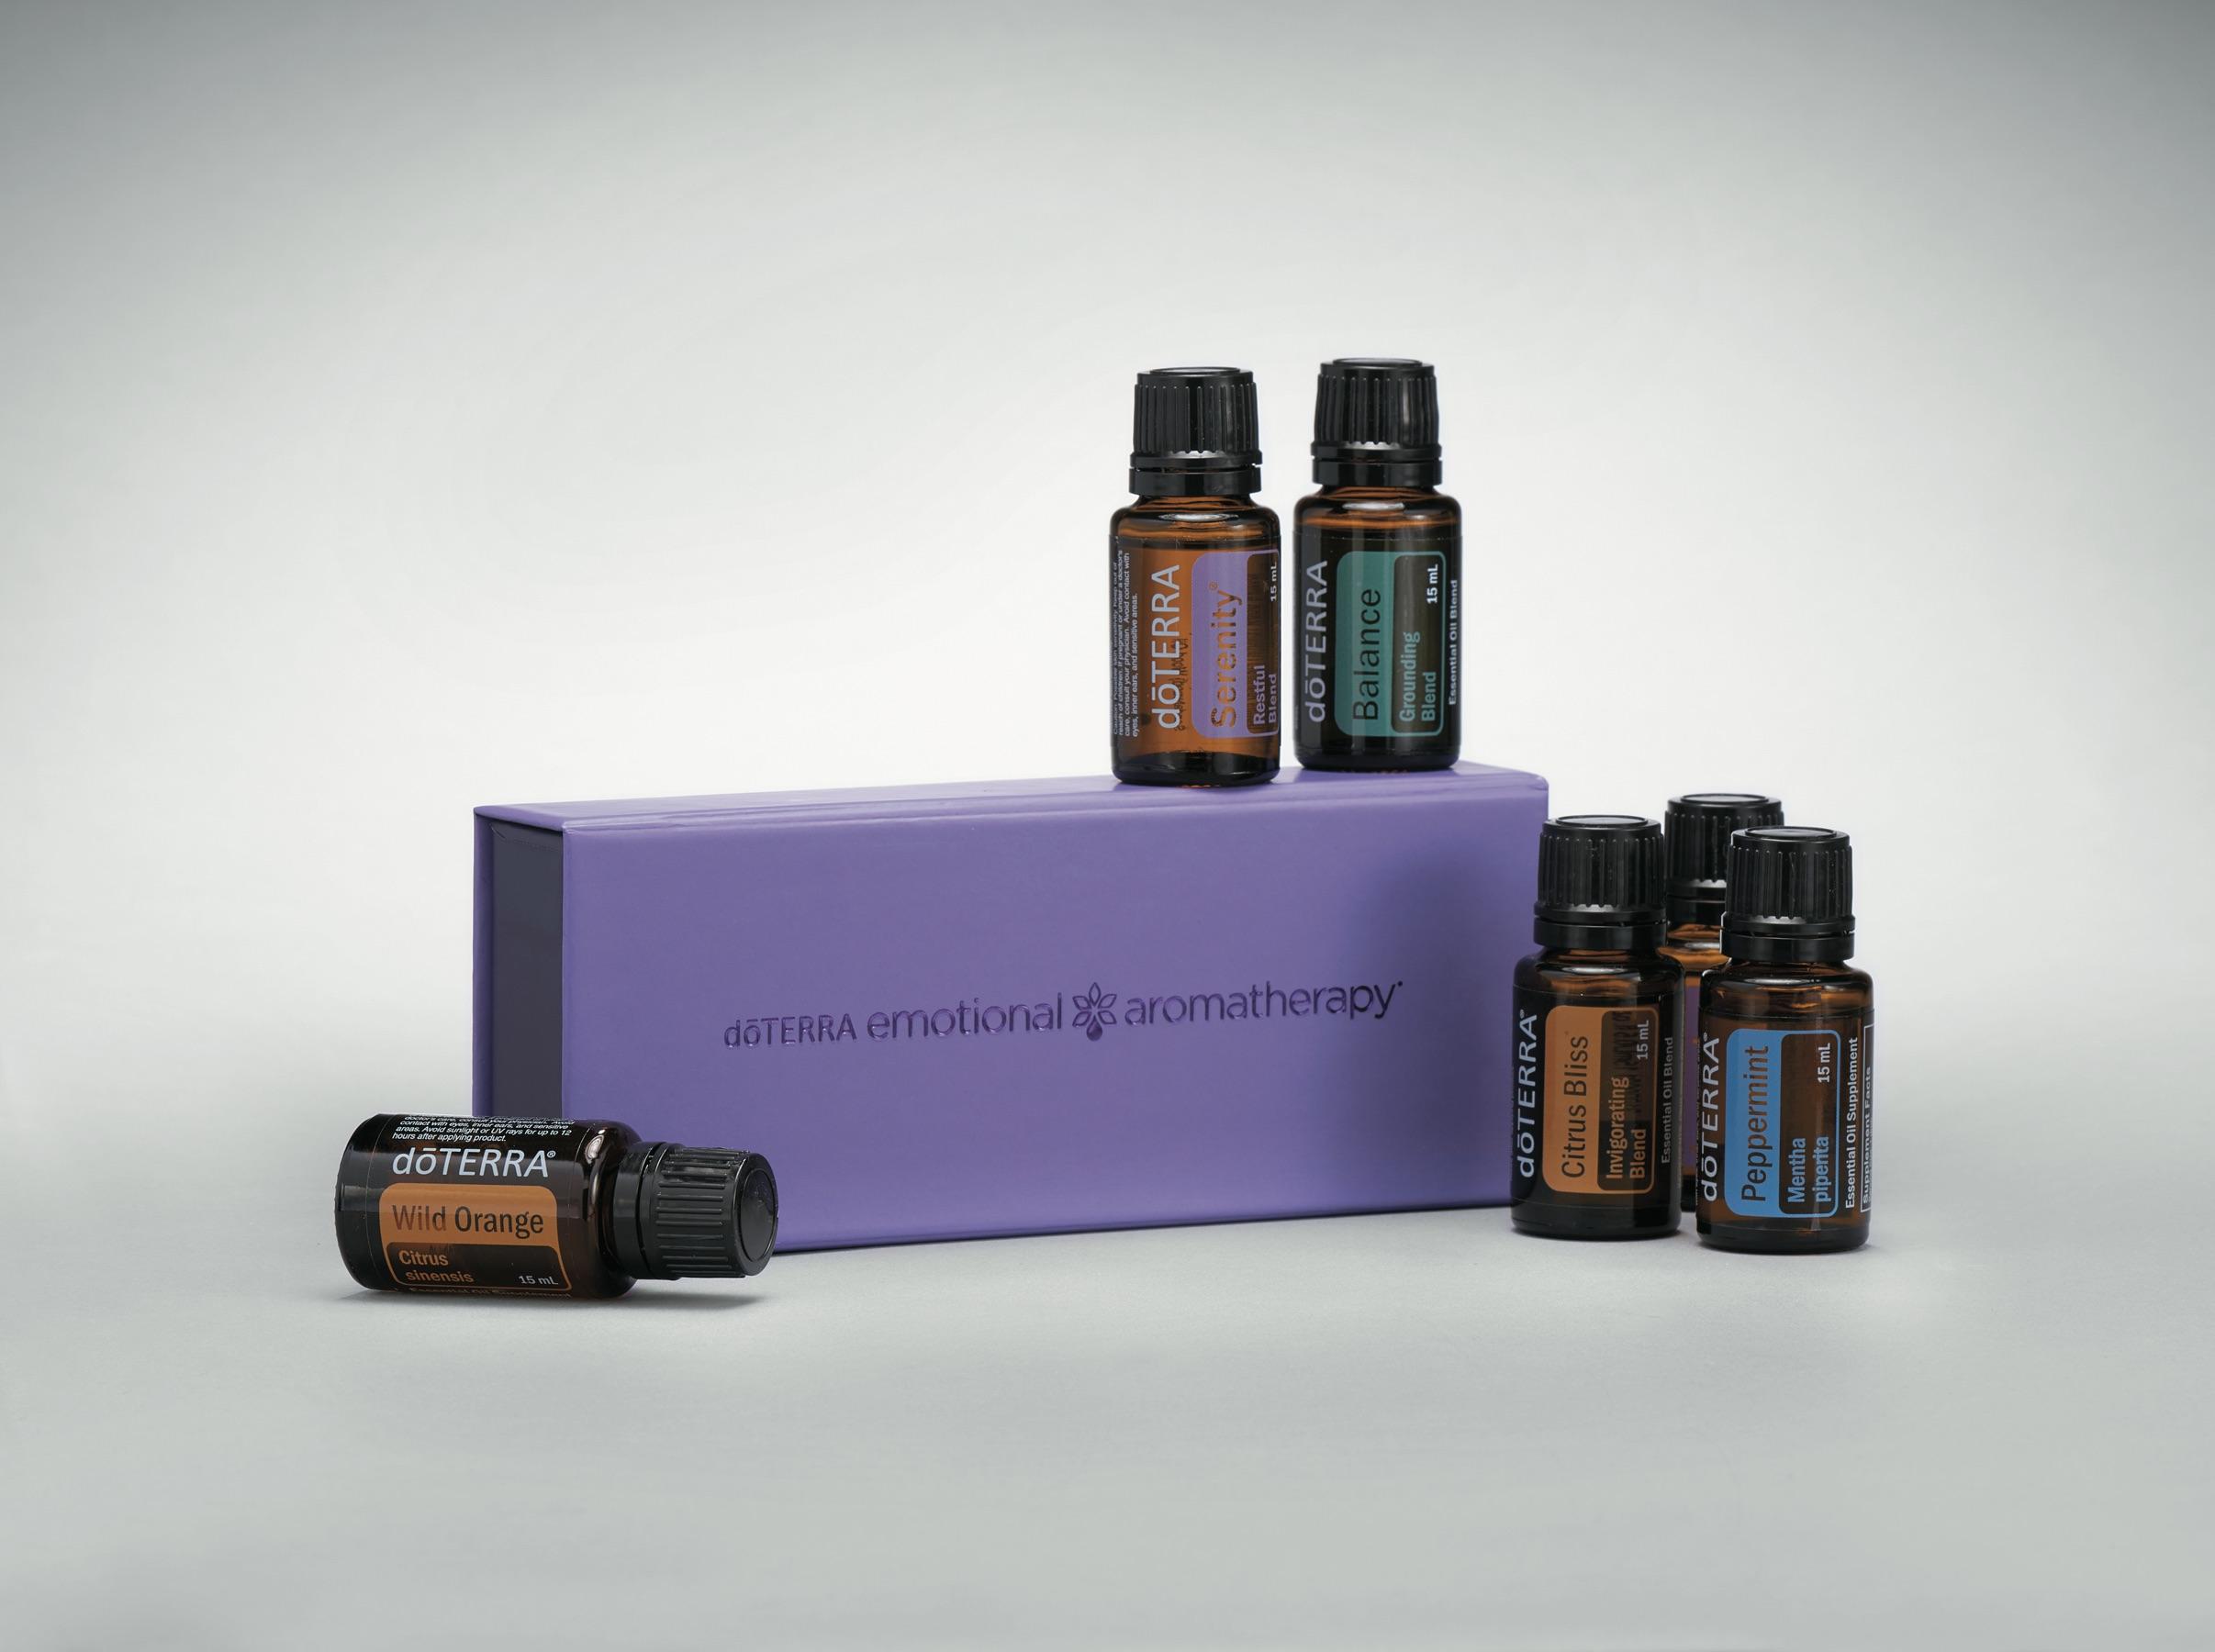 Favorite Aromatherapy Line: DōTerra